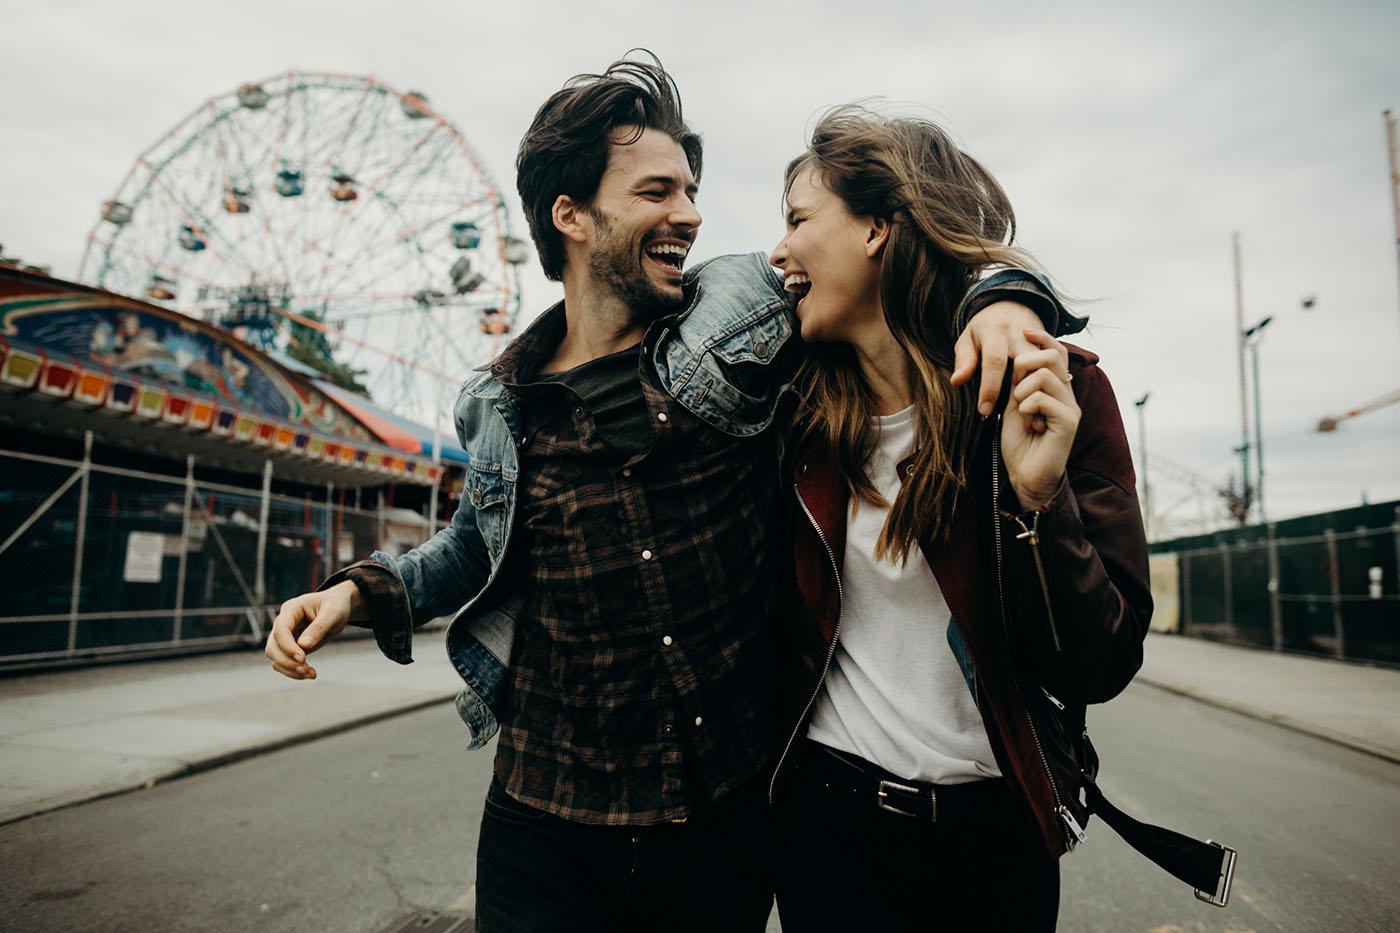 Verlovingsfoto op Coney Island